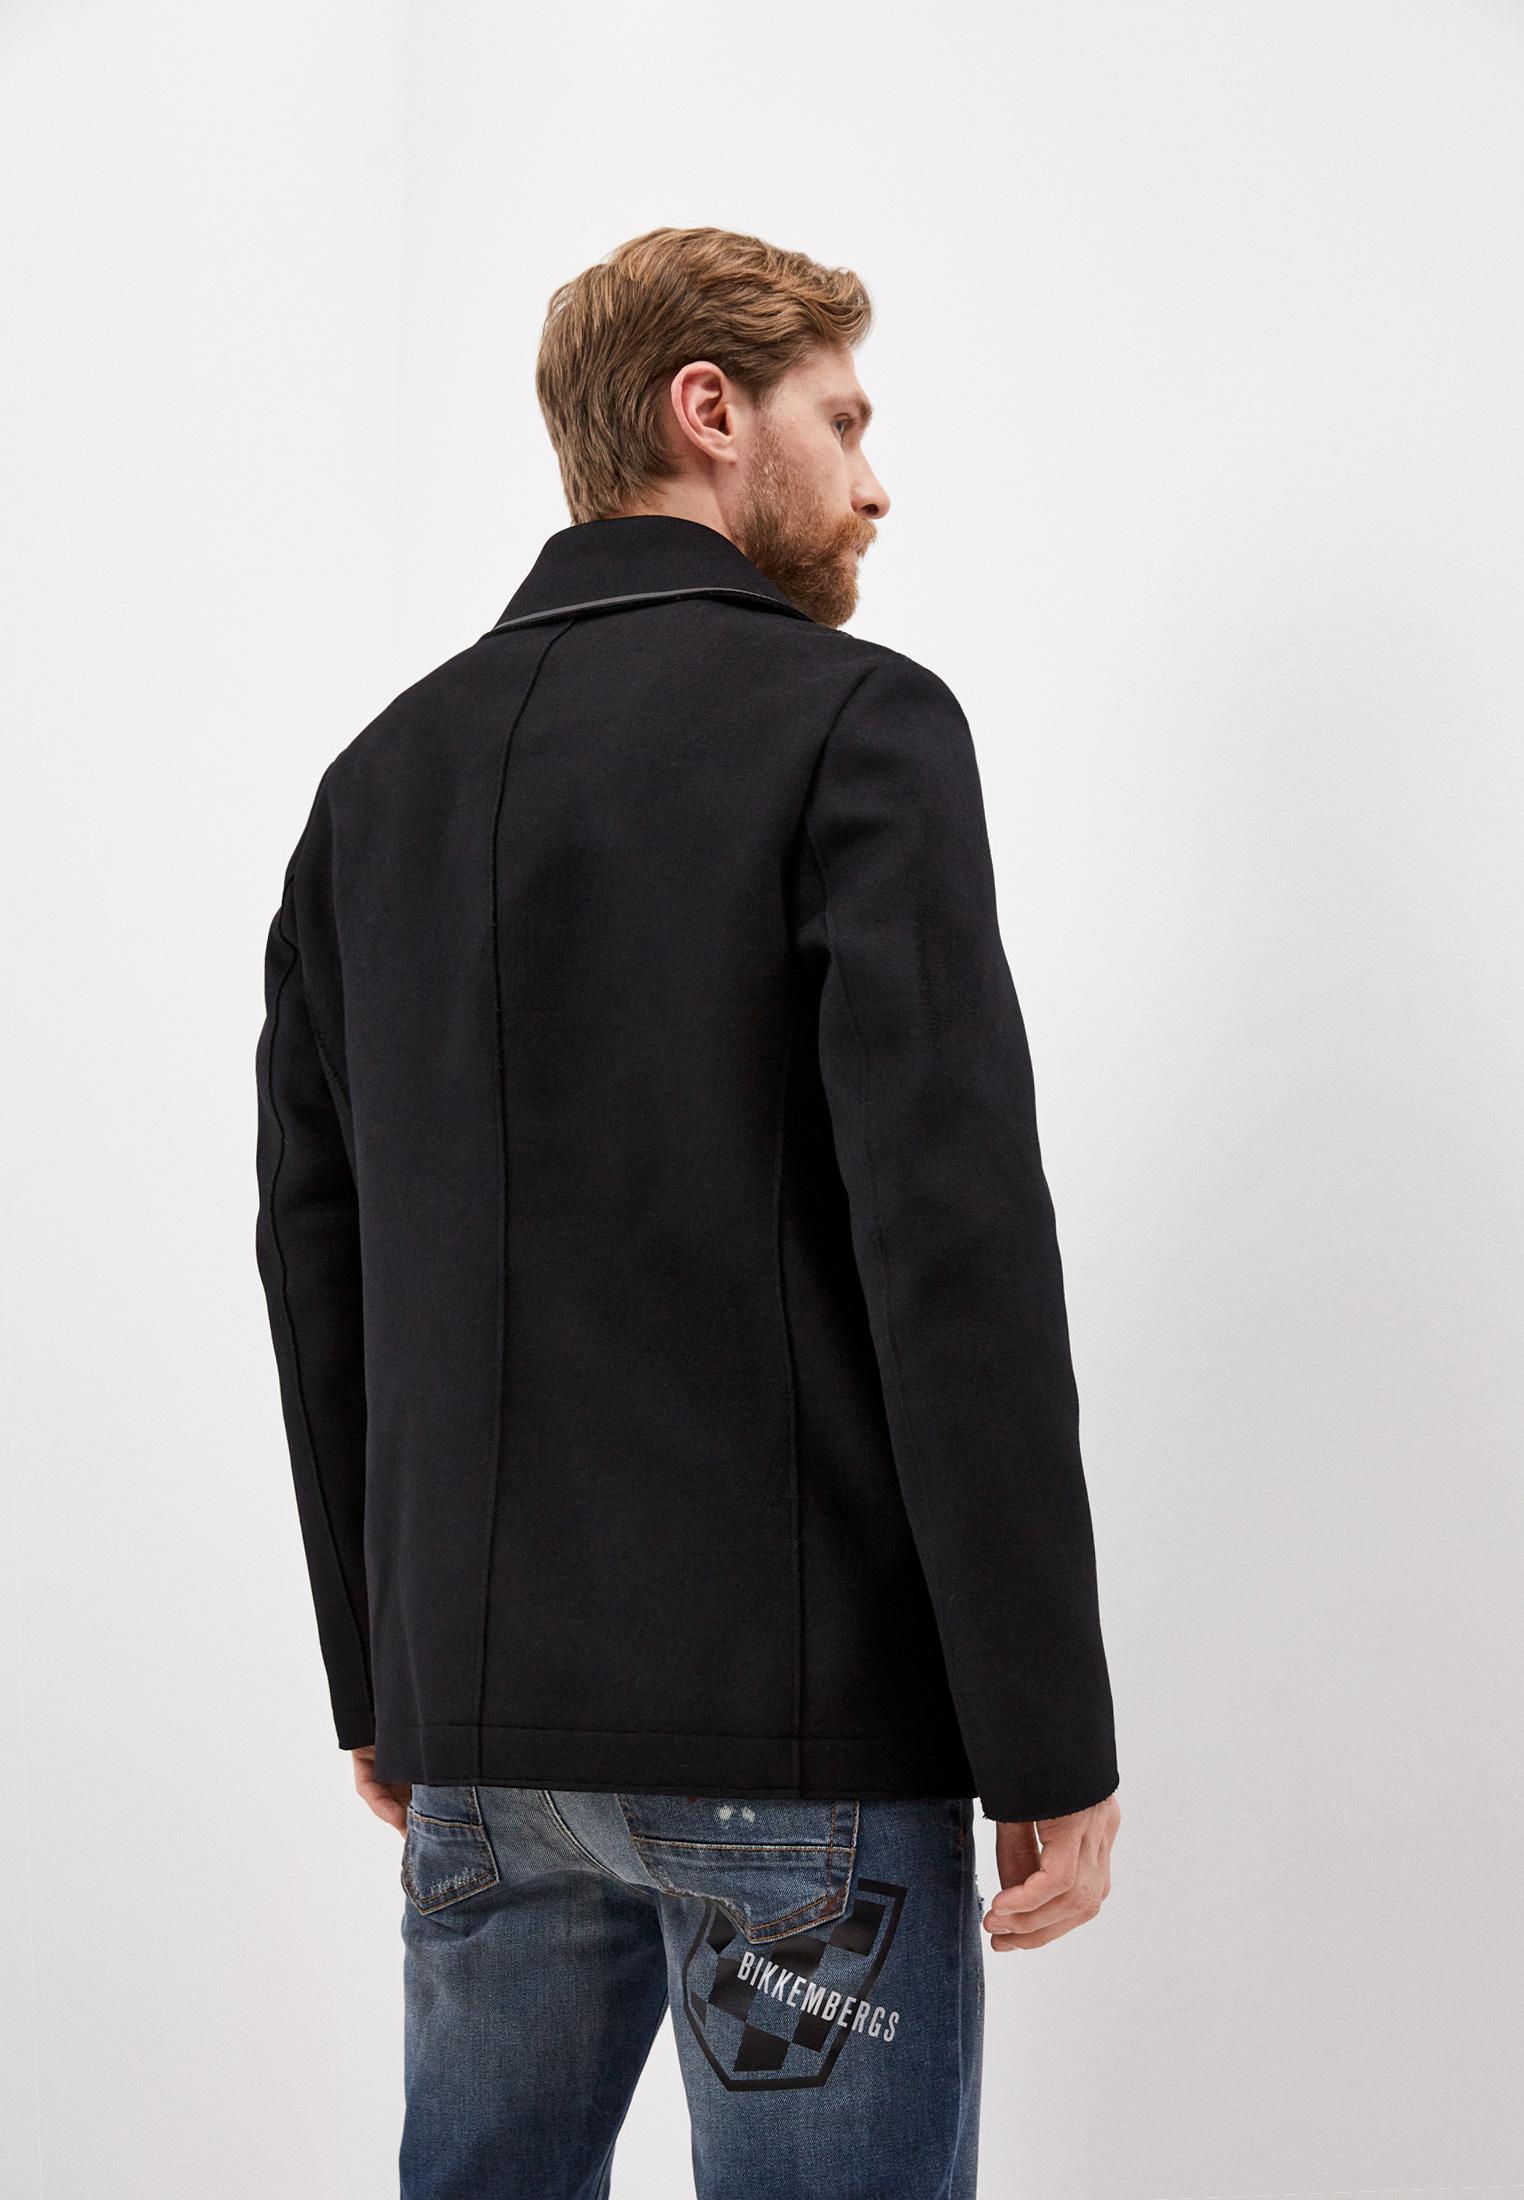 Мужское пальто Bikkembergs (Биккембергс) C J 005 01 T 9220: изображение 4